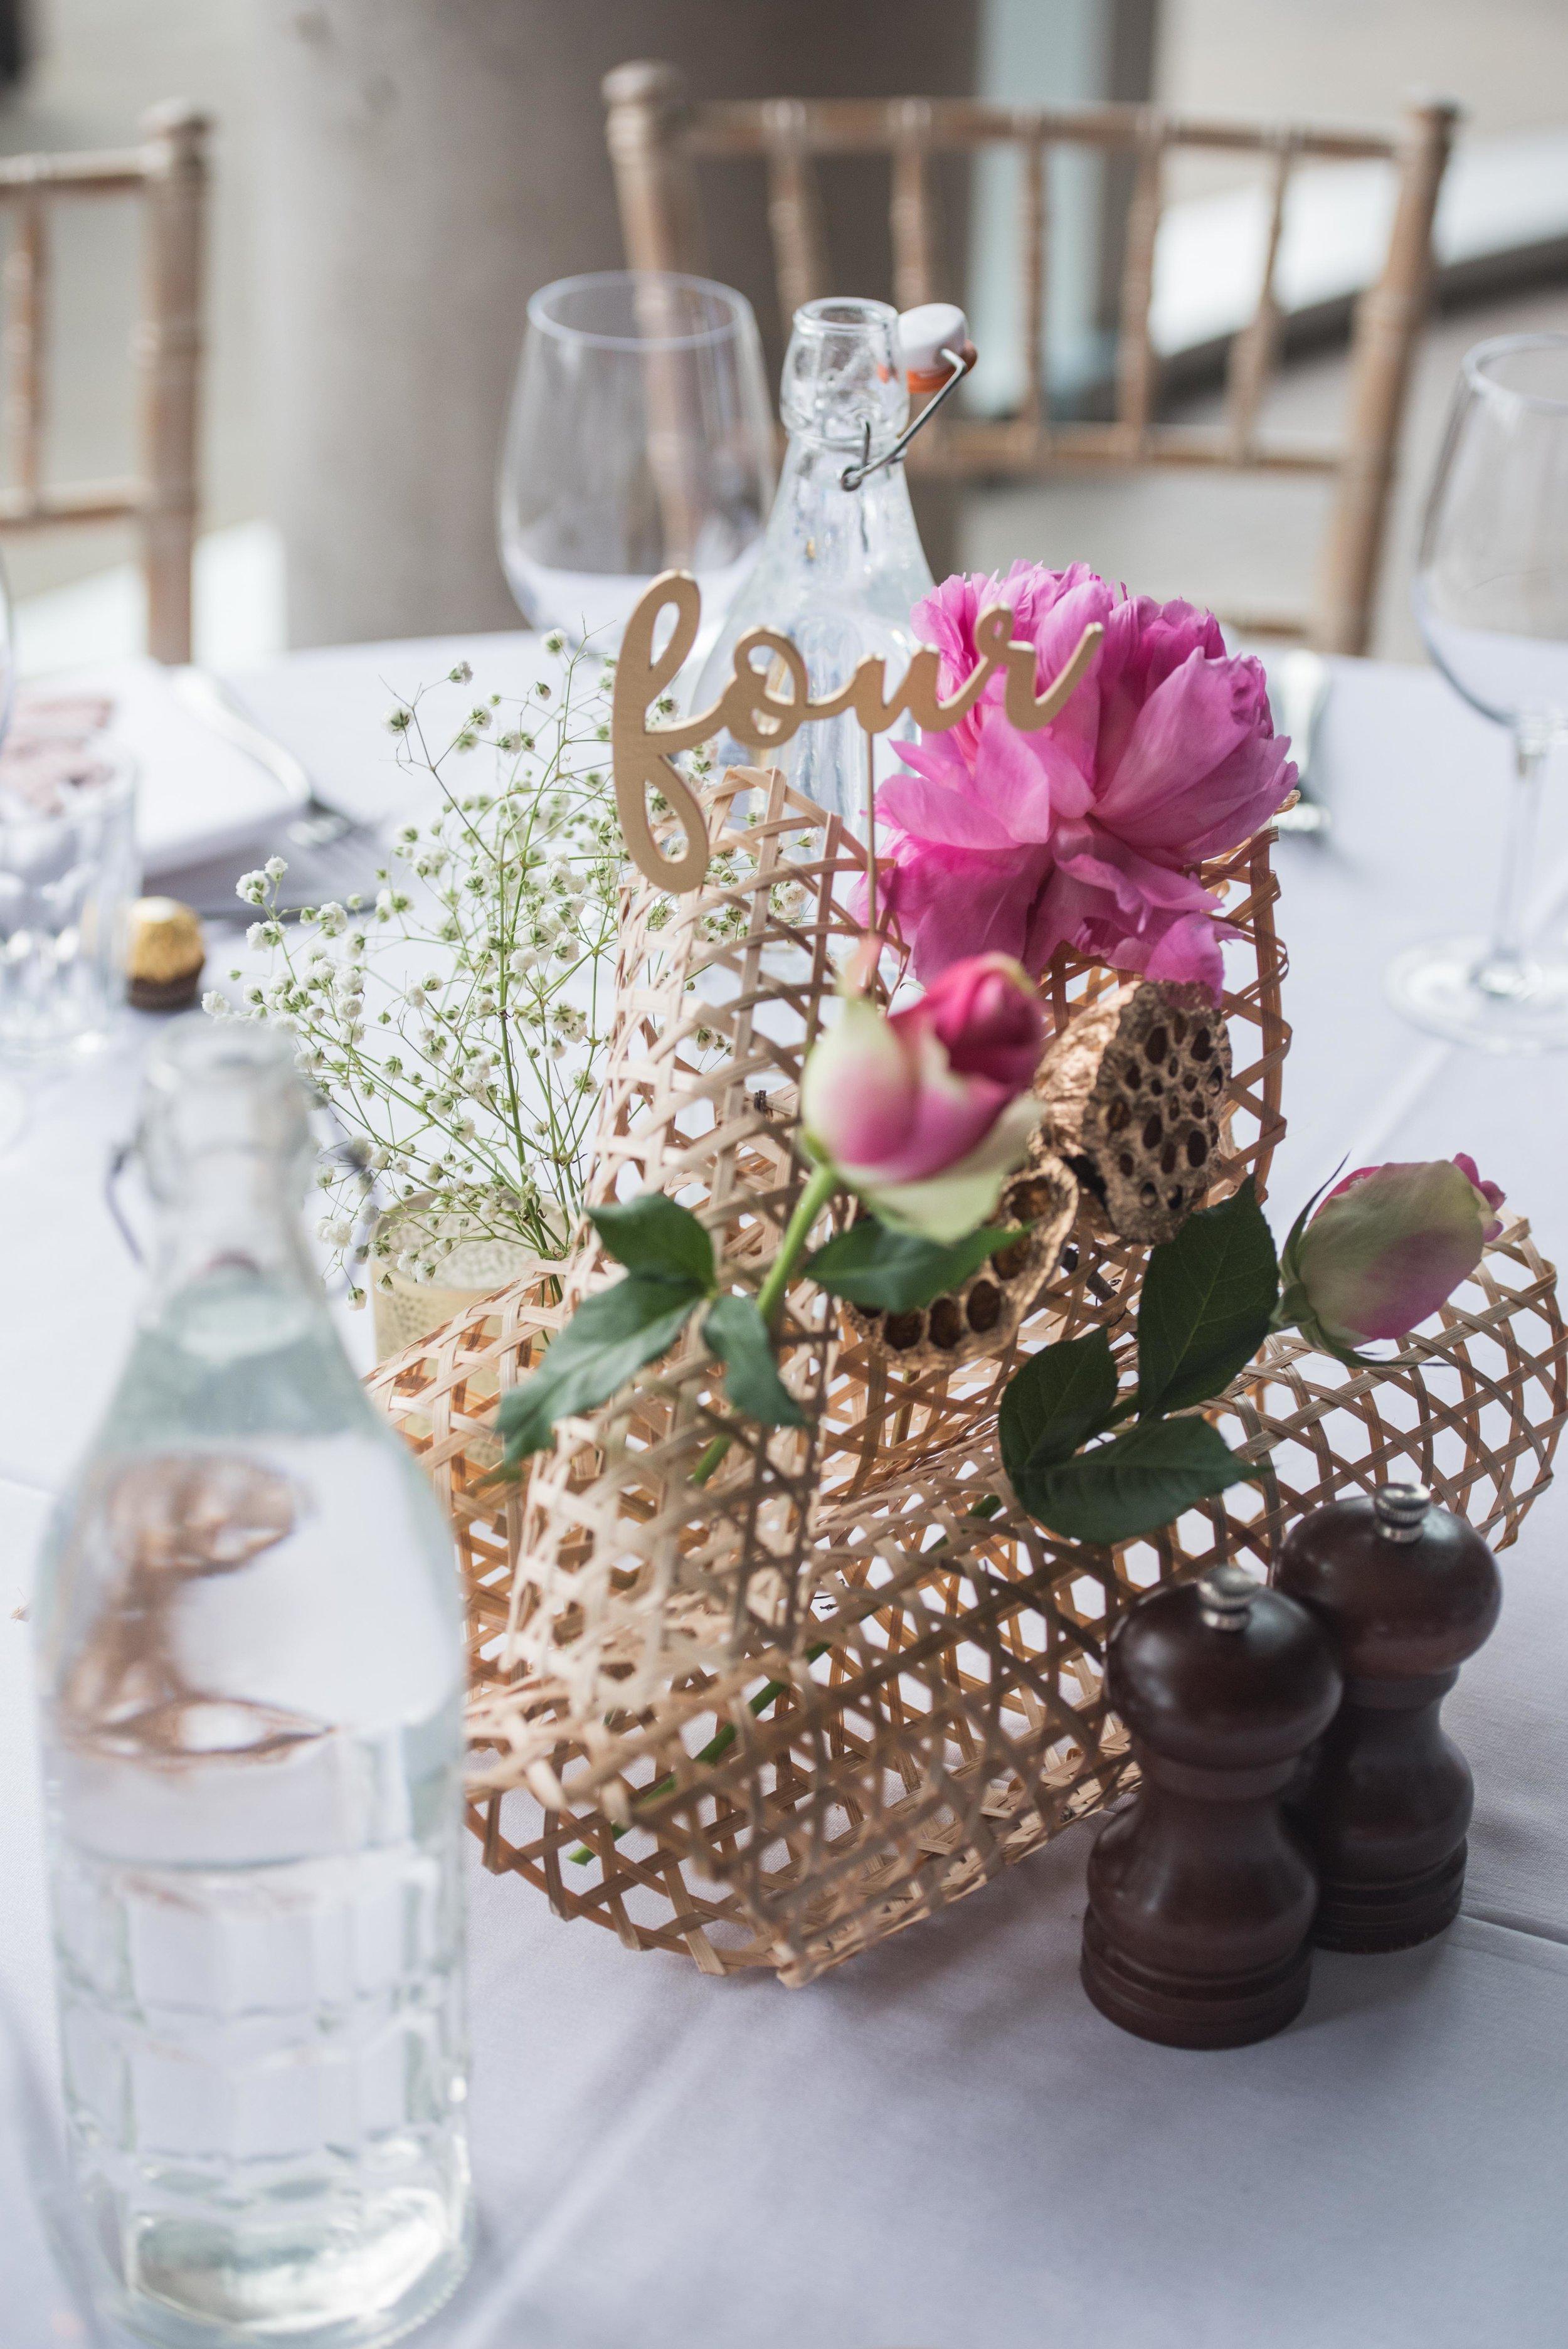 D&M_Marylebone Town Hall Wedding (203 of 239).jpg